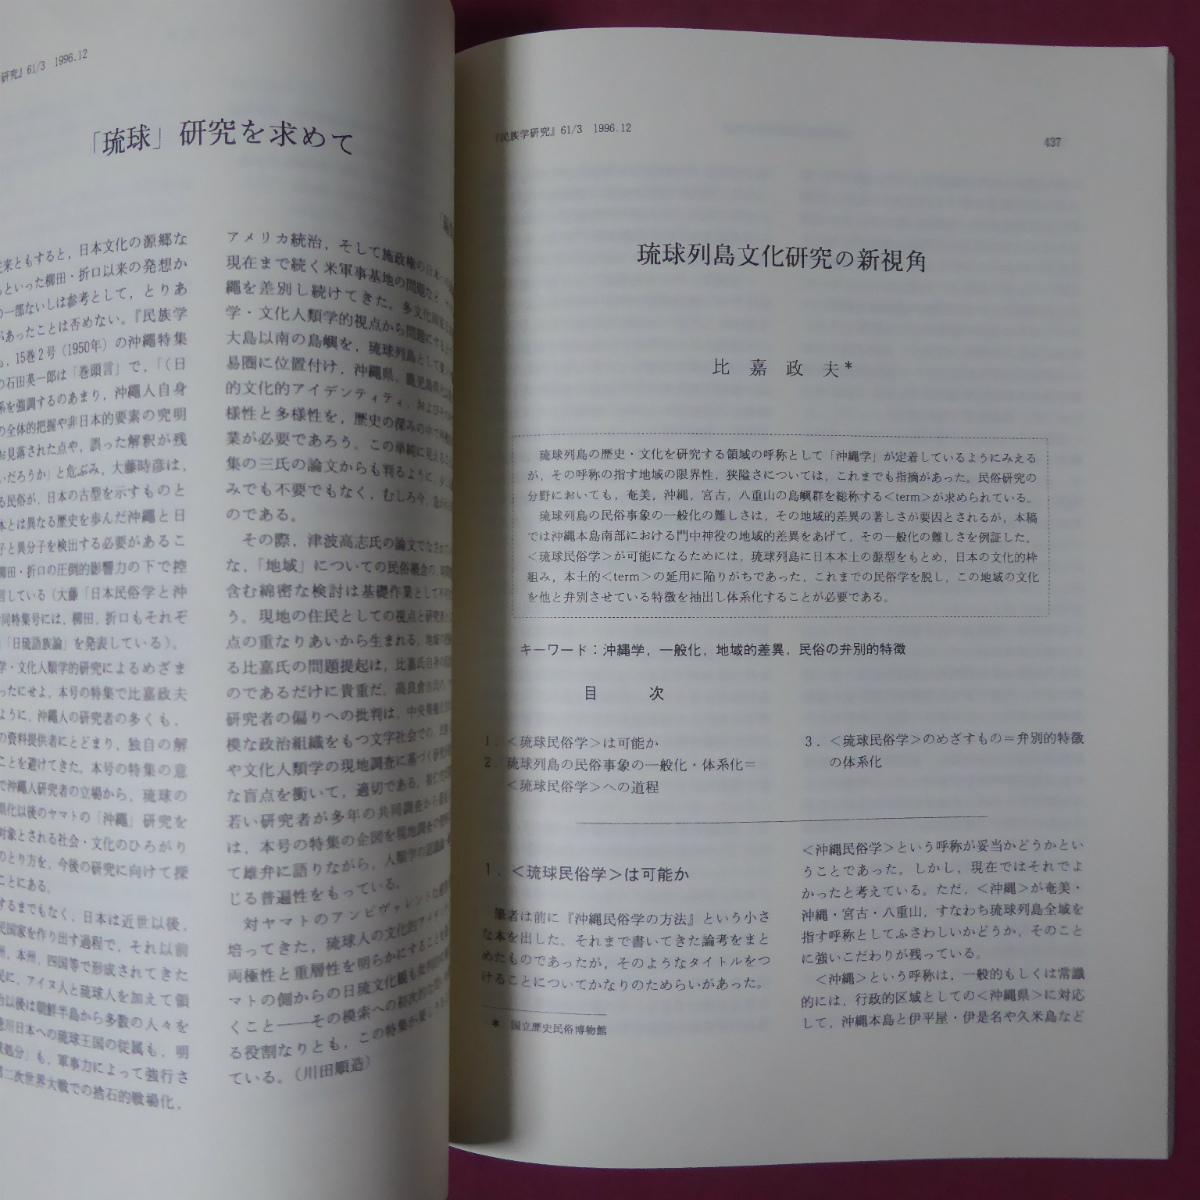 a11/ 民族學研究【「琉球」研究を求めて】在日韓国・朝鮮人の墓をめぐって/北西パキスタン・カラーシュ族の冬至祭り_画像9